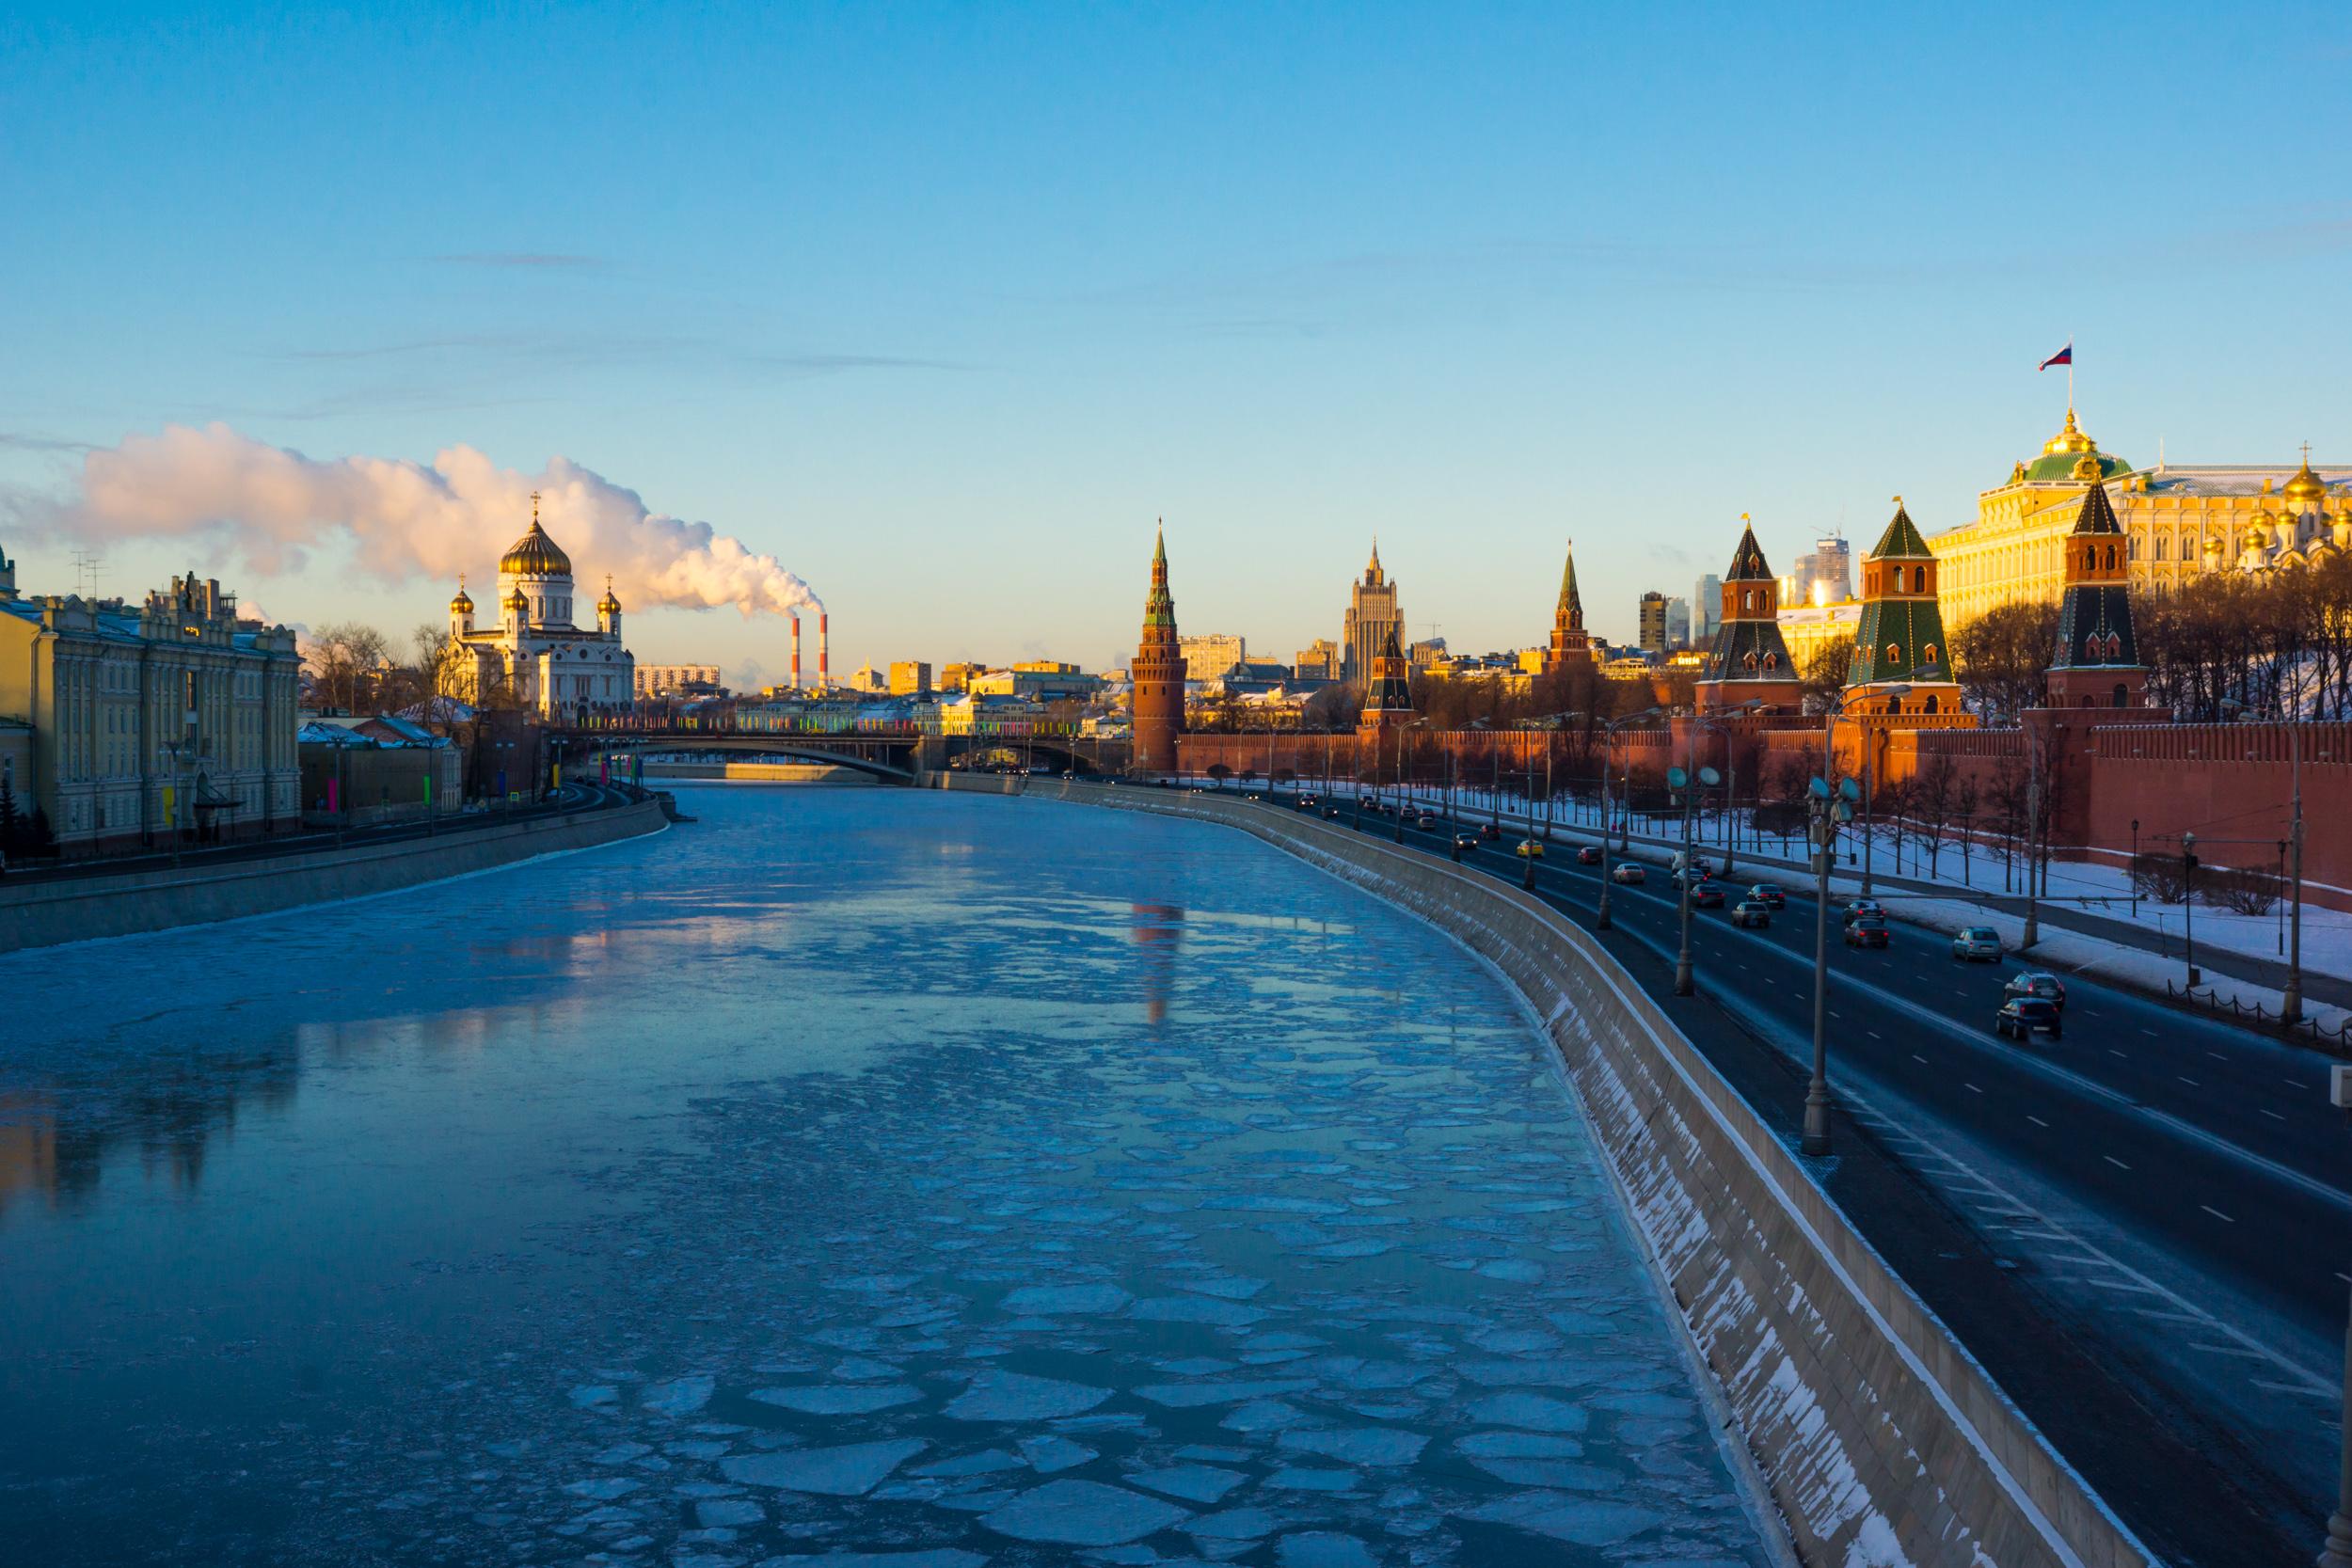 фото Москва реки зимой